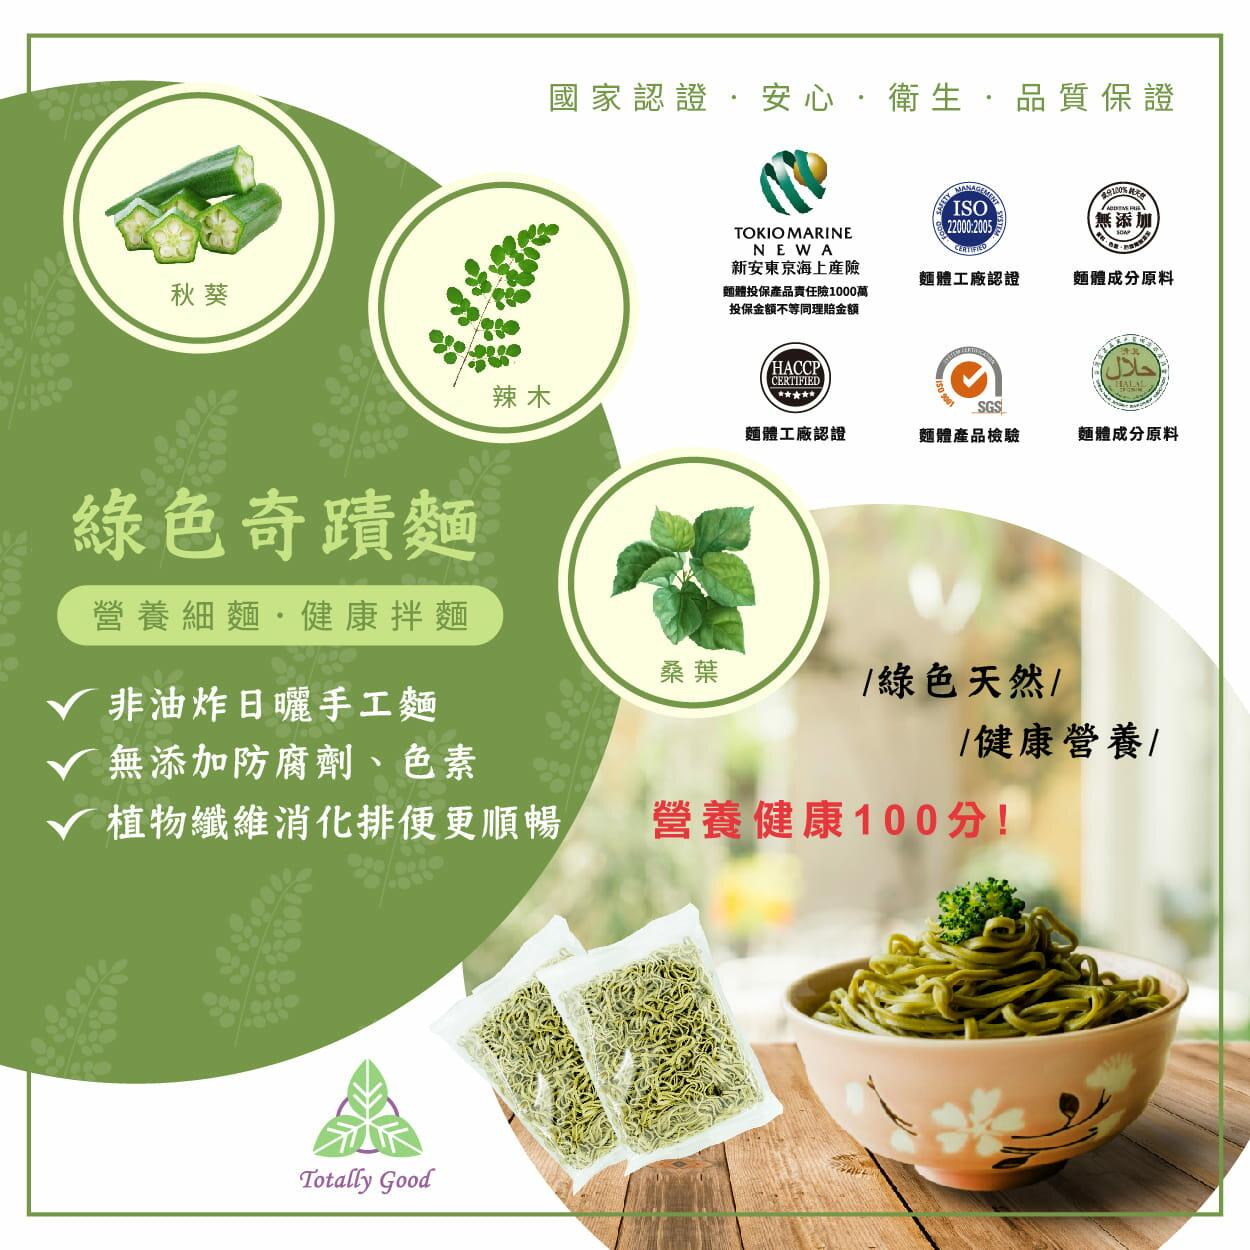 【 Mr.SU】職人峰拌麵-老薑麻油風味家庭包(5包入) 乾拌麵/手工麵